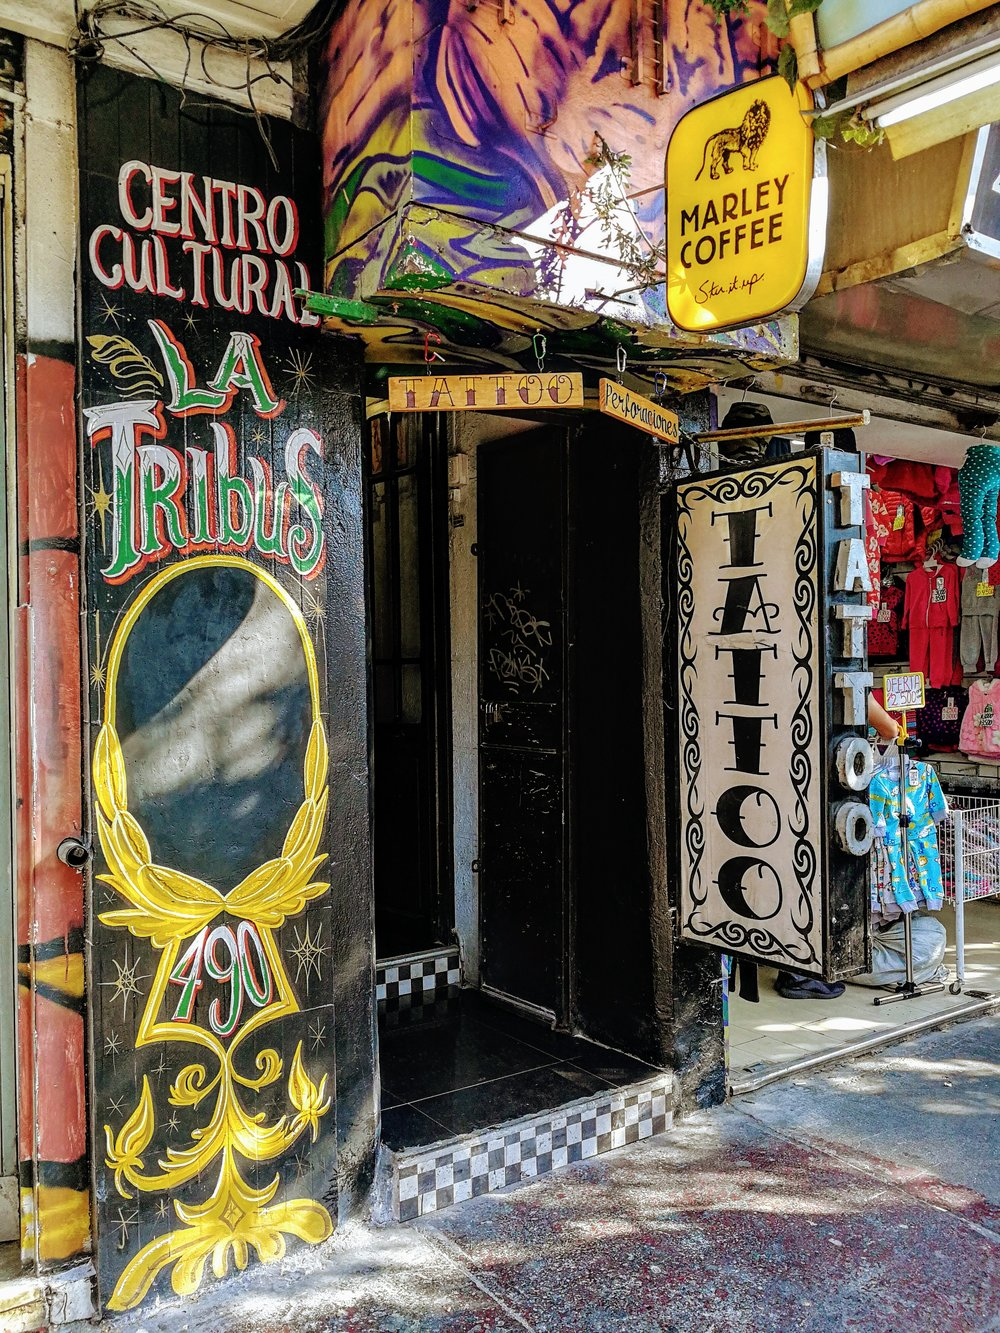 Visit El café vegan de La Tribus for some delicious vegan backed goods including empanadas and pastries in Santiago de Chile. This tattoo parlour, grow shop, and vegan cafe has it all!